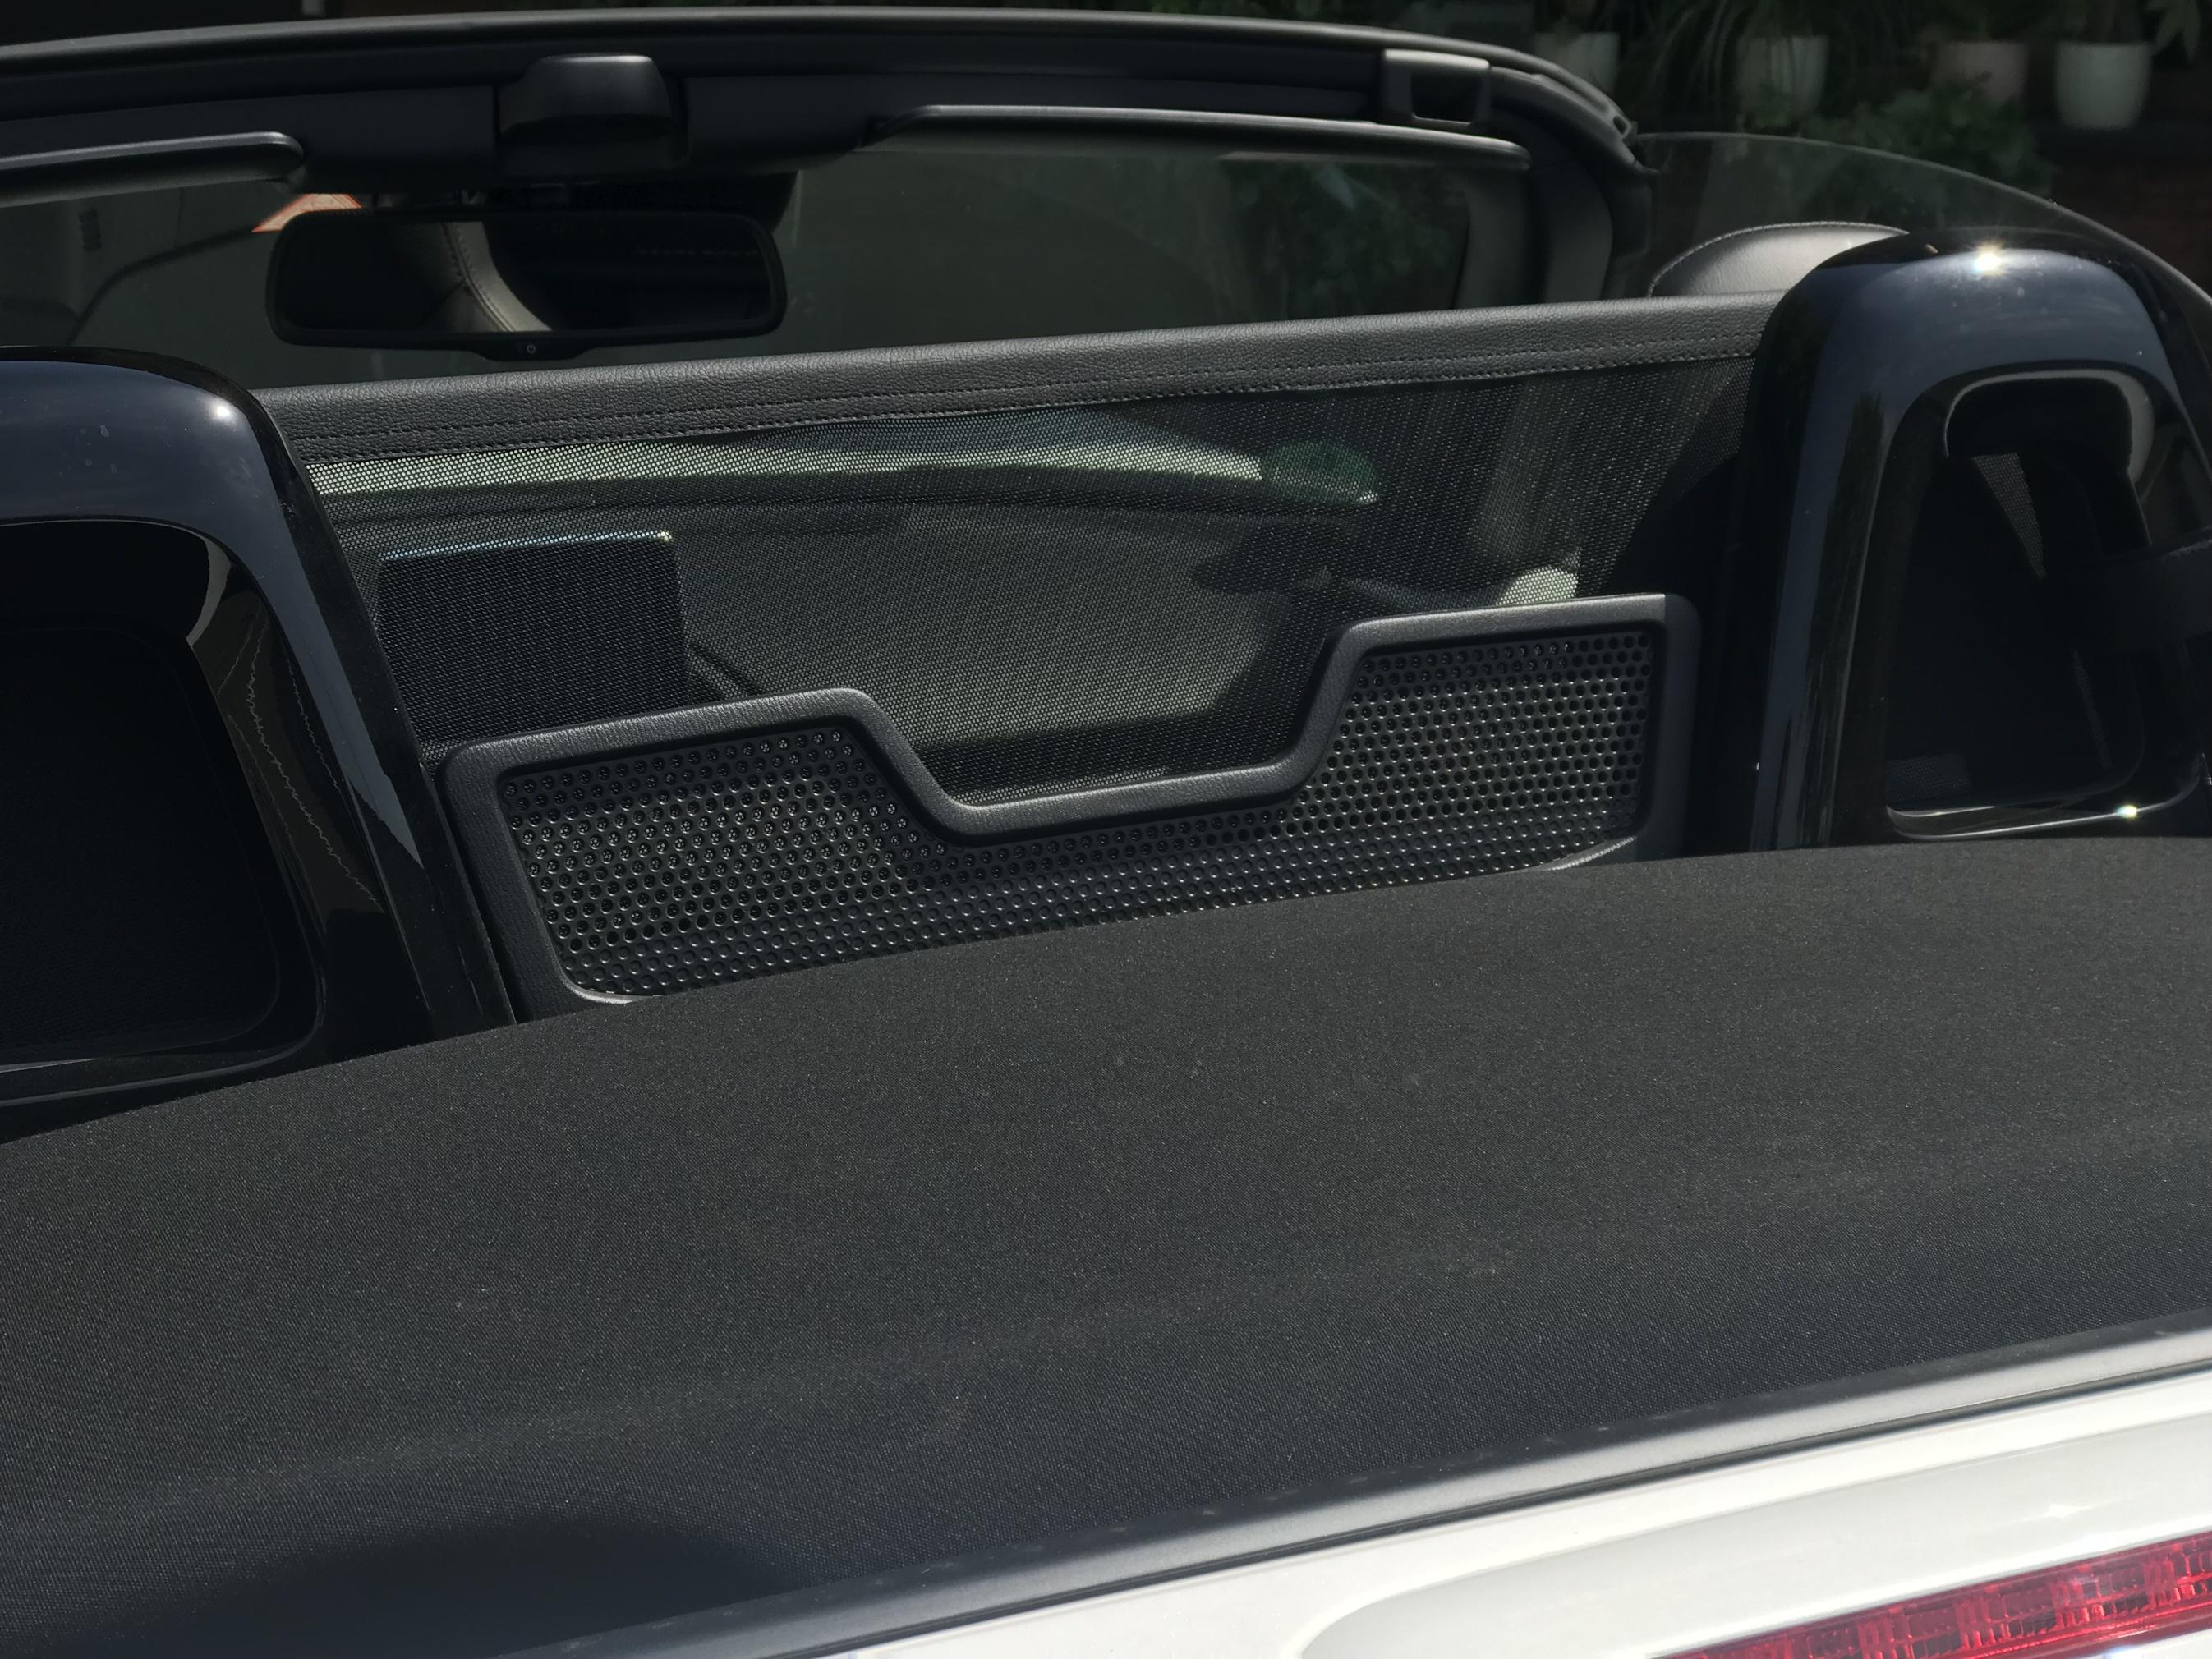 airax windschott windscherm f r mazda mx 5 mx5 nd mk3 in. Black Bedroom Furniture Sets. Home Design Ideas